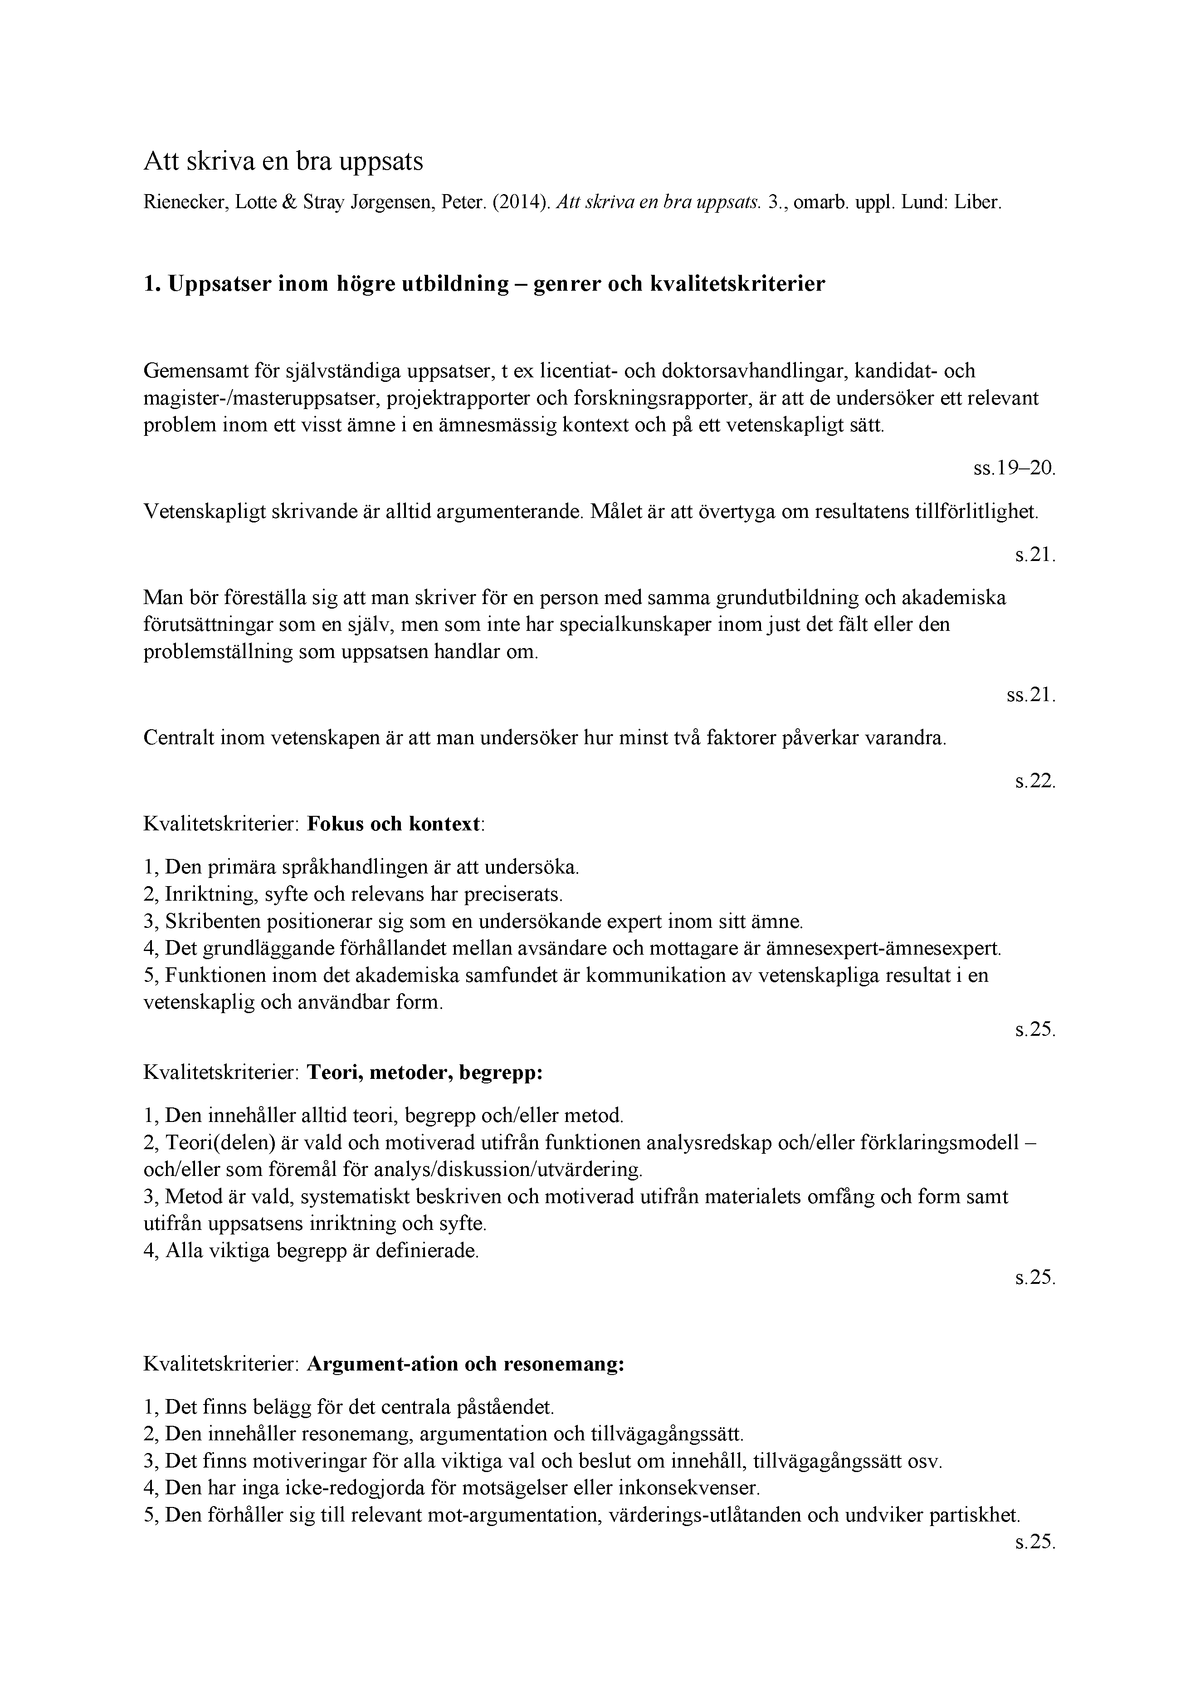 hur skriver man en metod